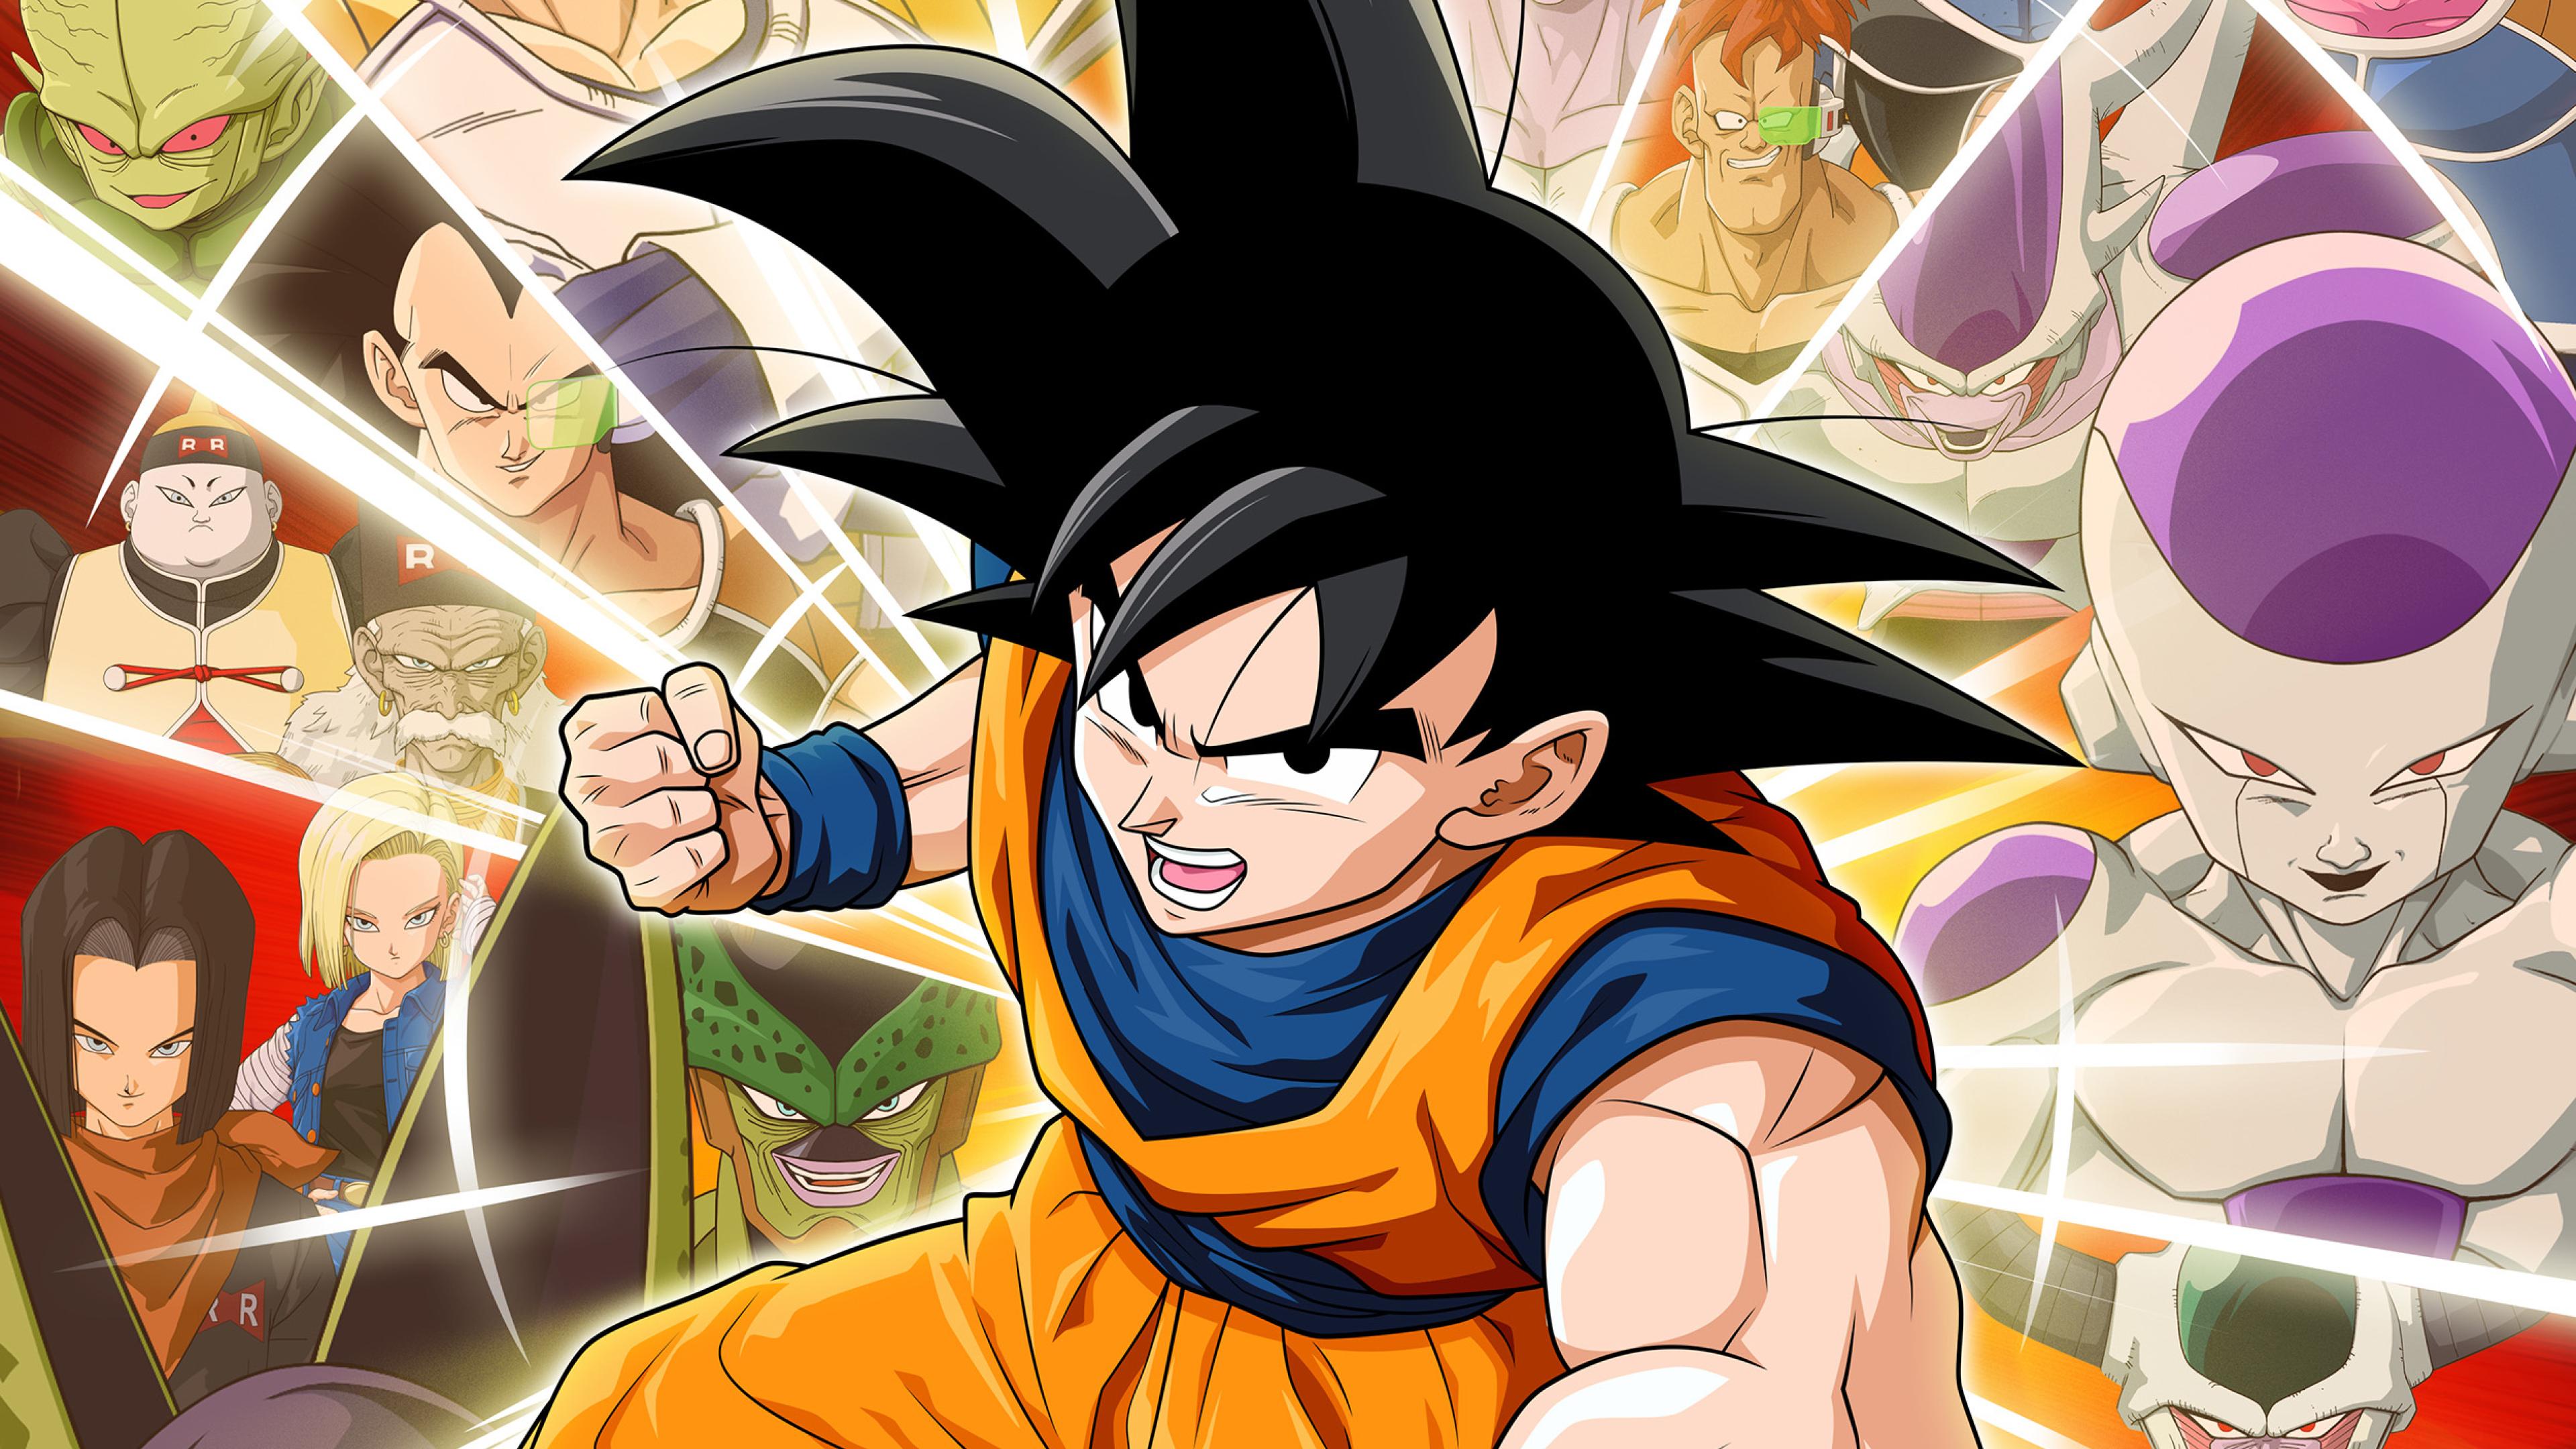 3840x2160 Dragon Ball Z Kakarot Game Poster 4K Wallpaper ...